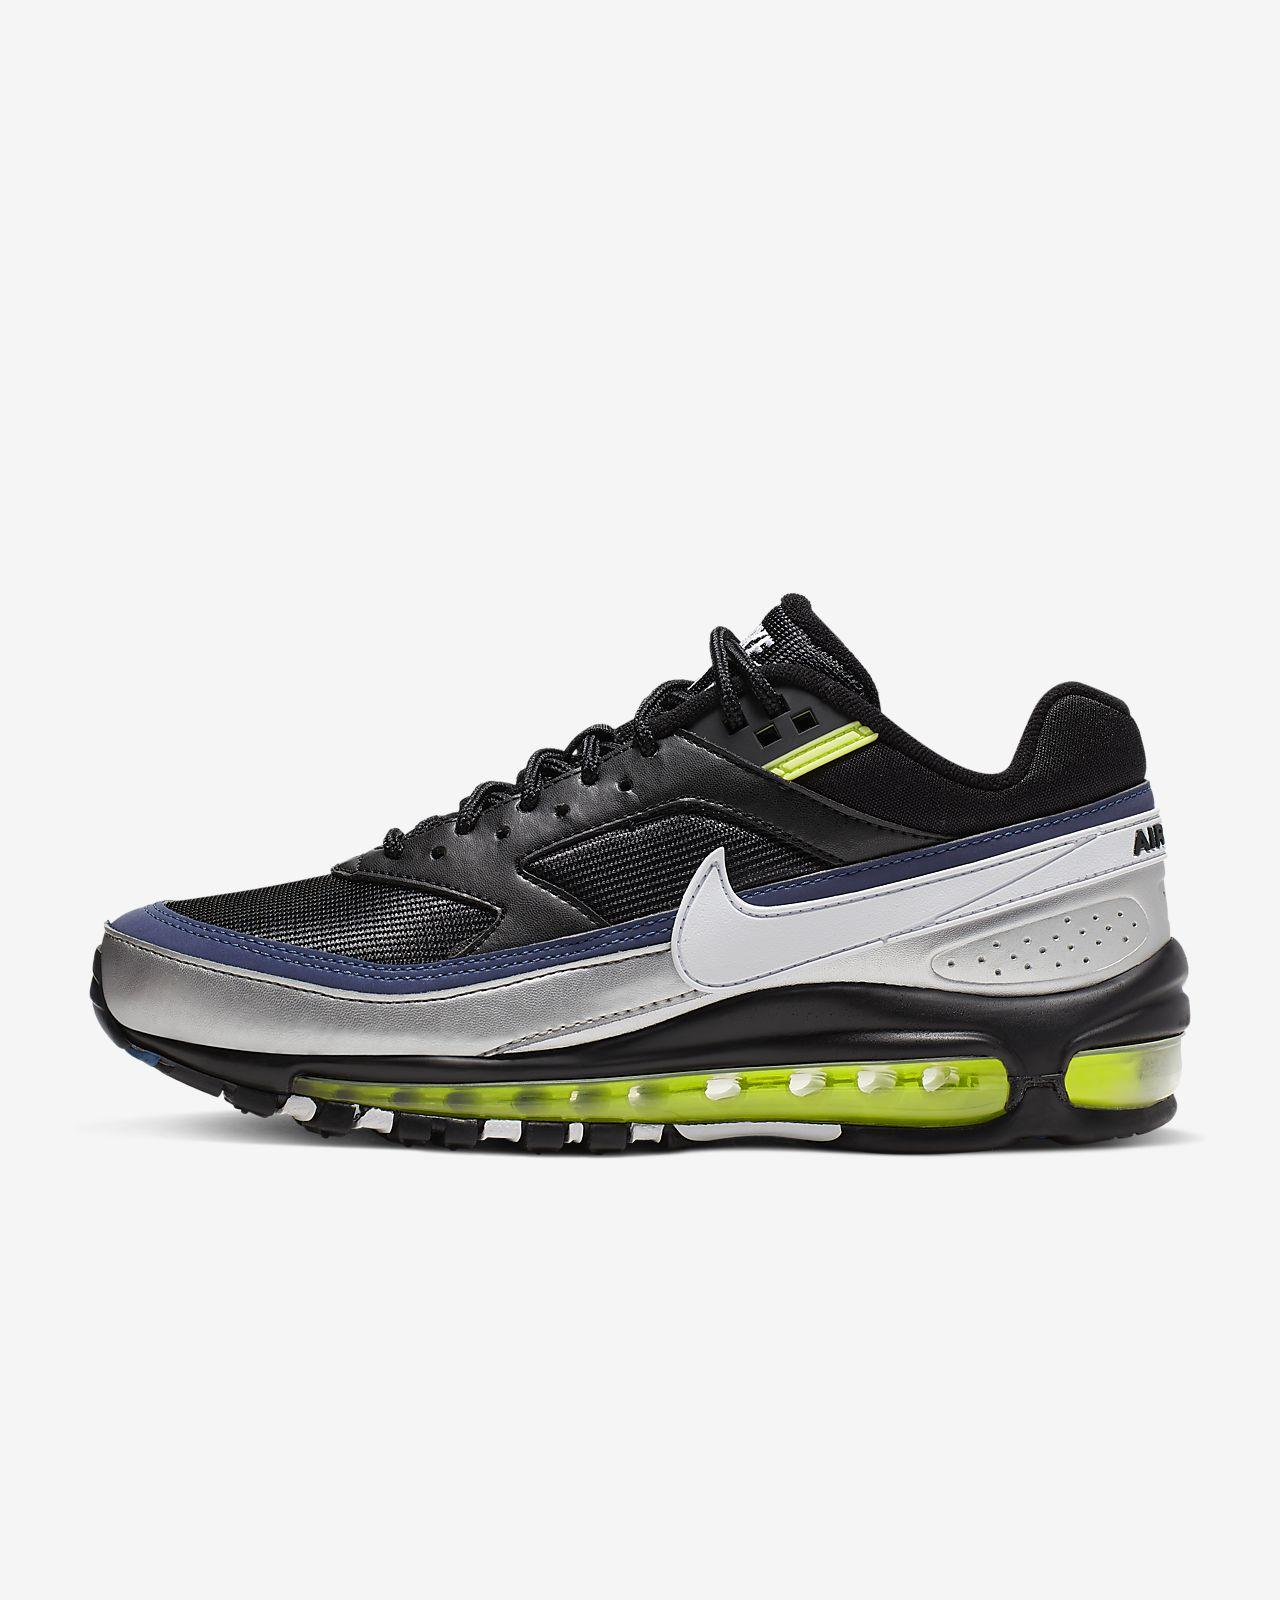 492a12bd996 Nike Air Max 97 BW Men s Shoe. Nike.com ID